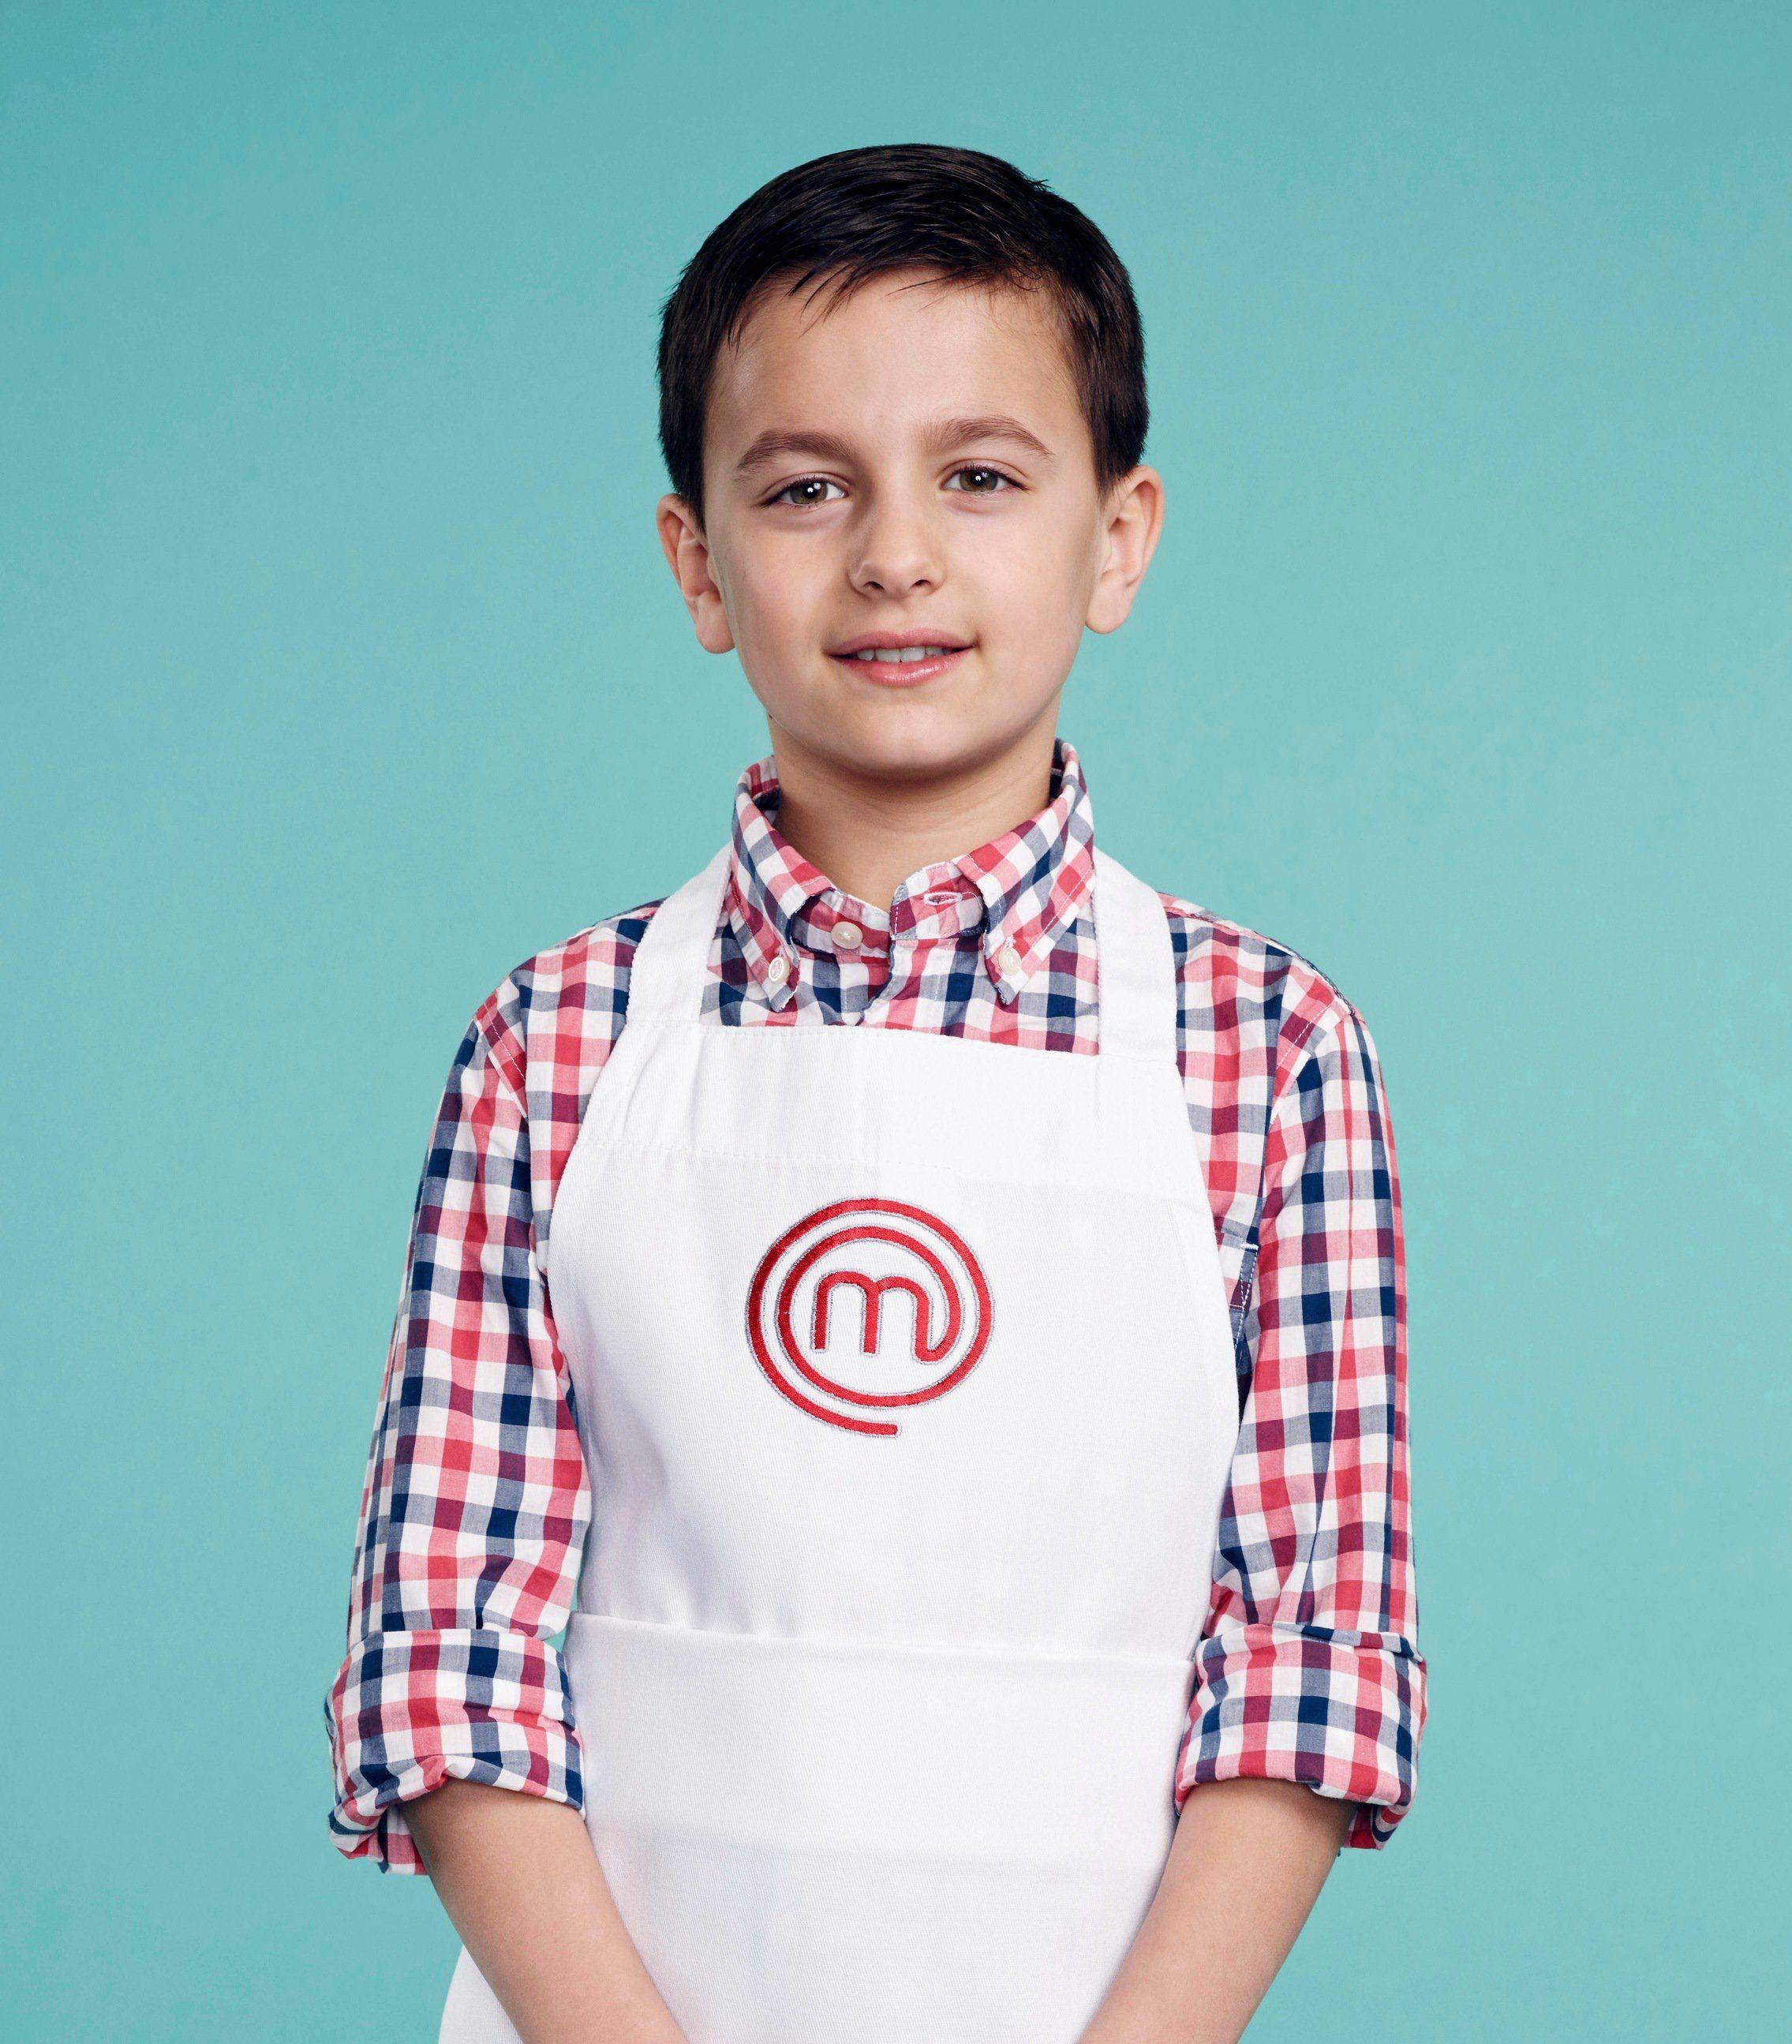 Meet the Cute Kid Contestants on the New Season of Masterchef Junior ...